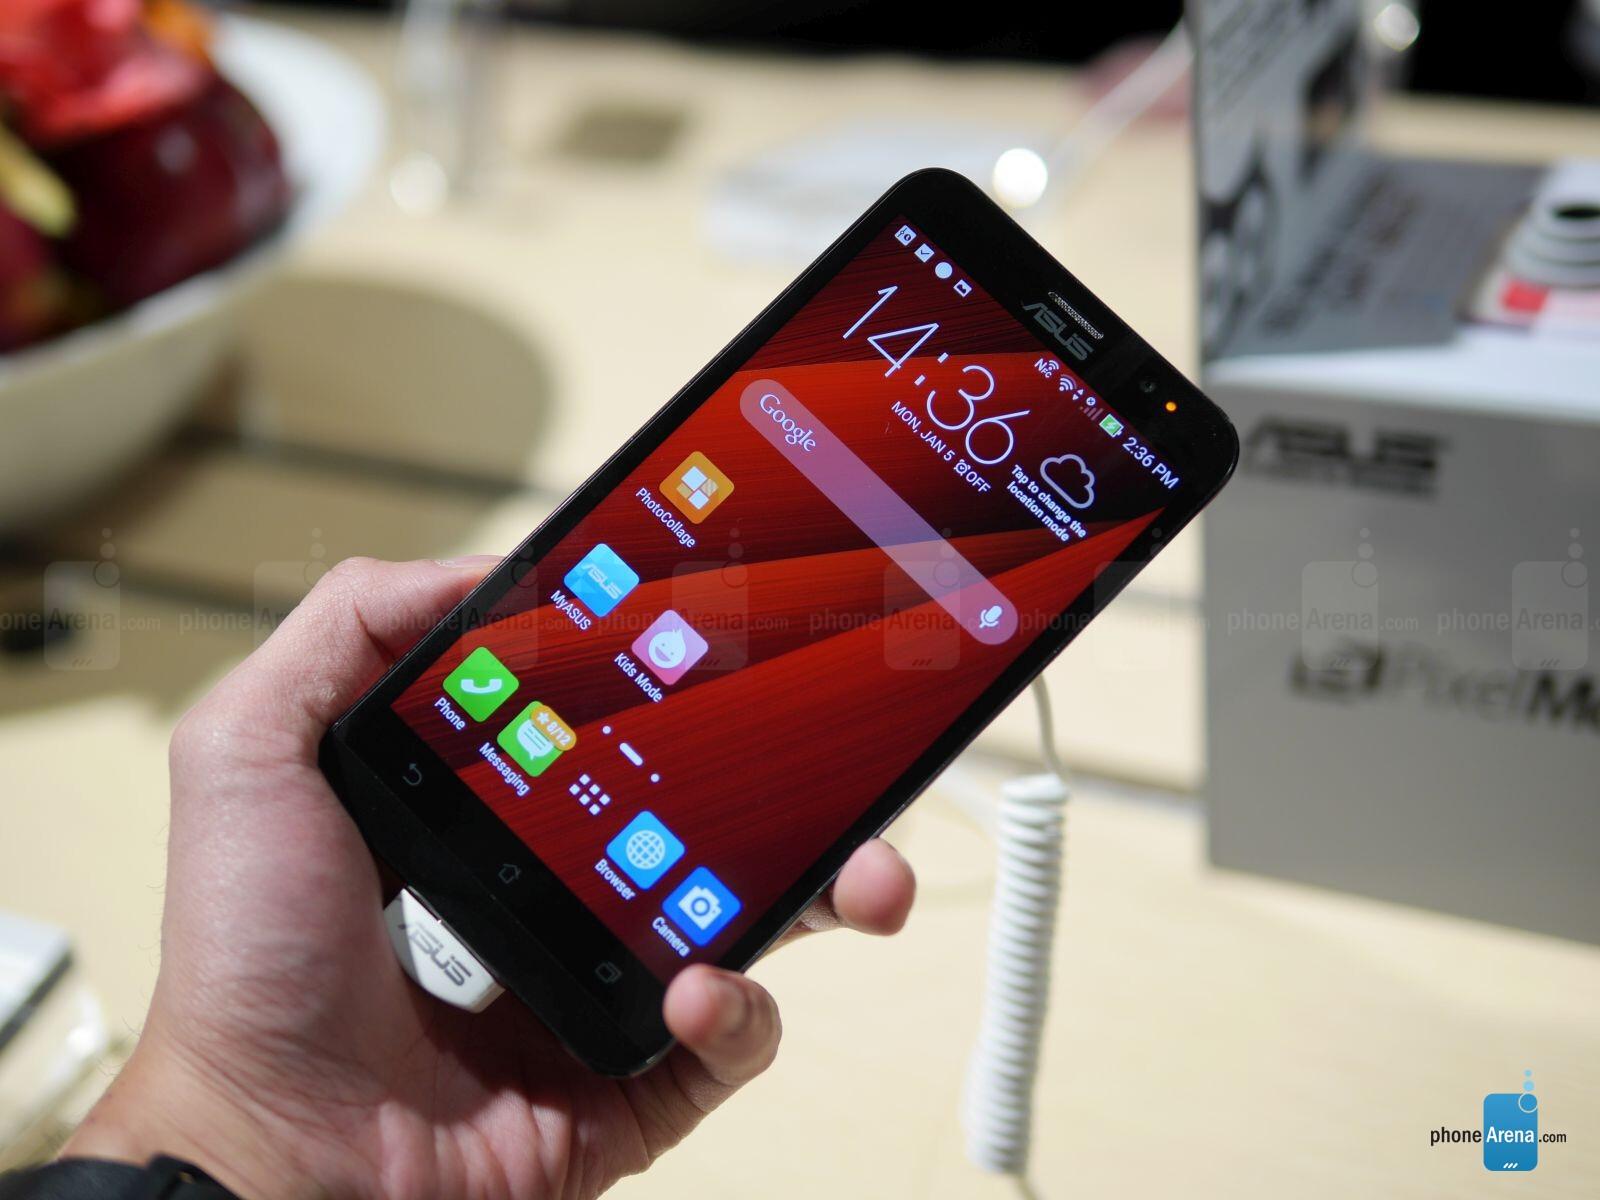 Купить Asus ZenFone 2 ZE551ML 16Gb black: цена